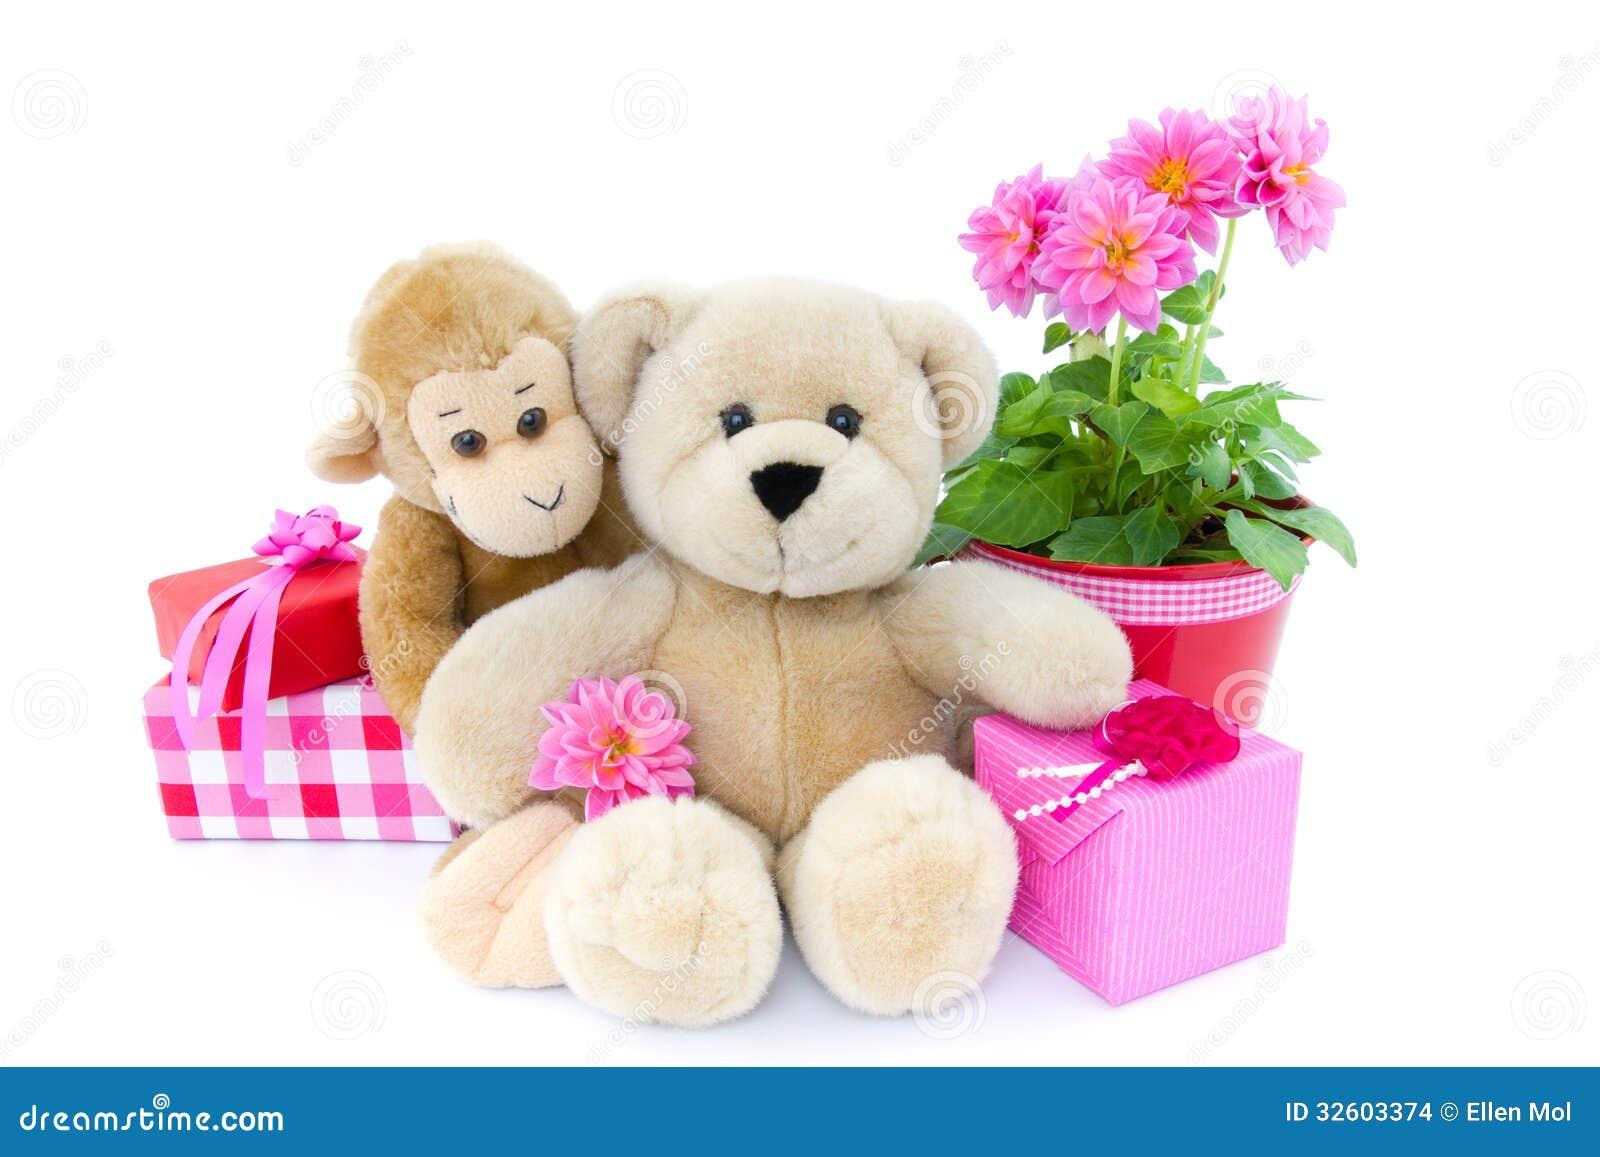 Cuddly teddy bear images - jon olsson audi r8 wallpaper for computer